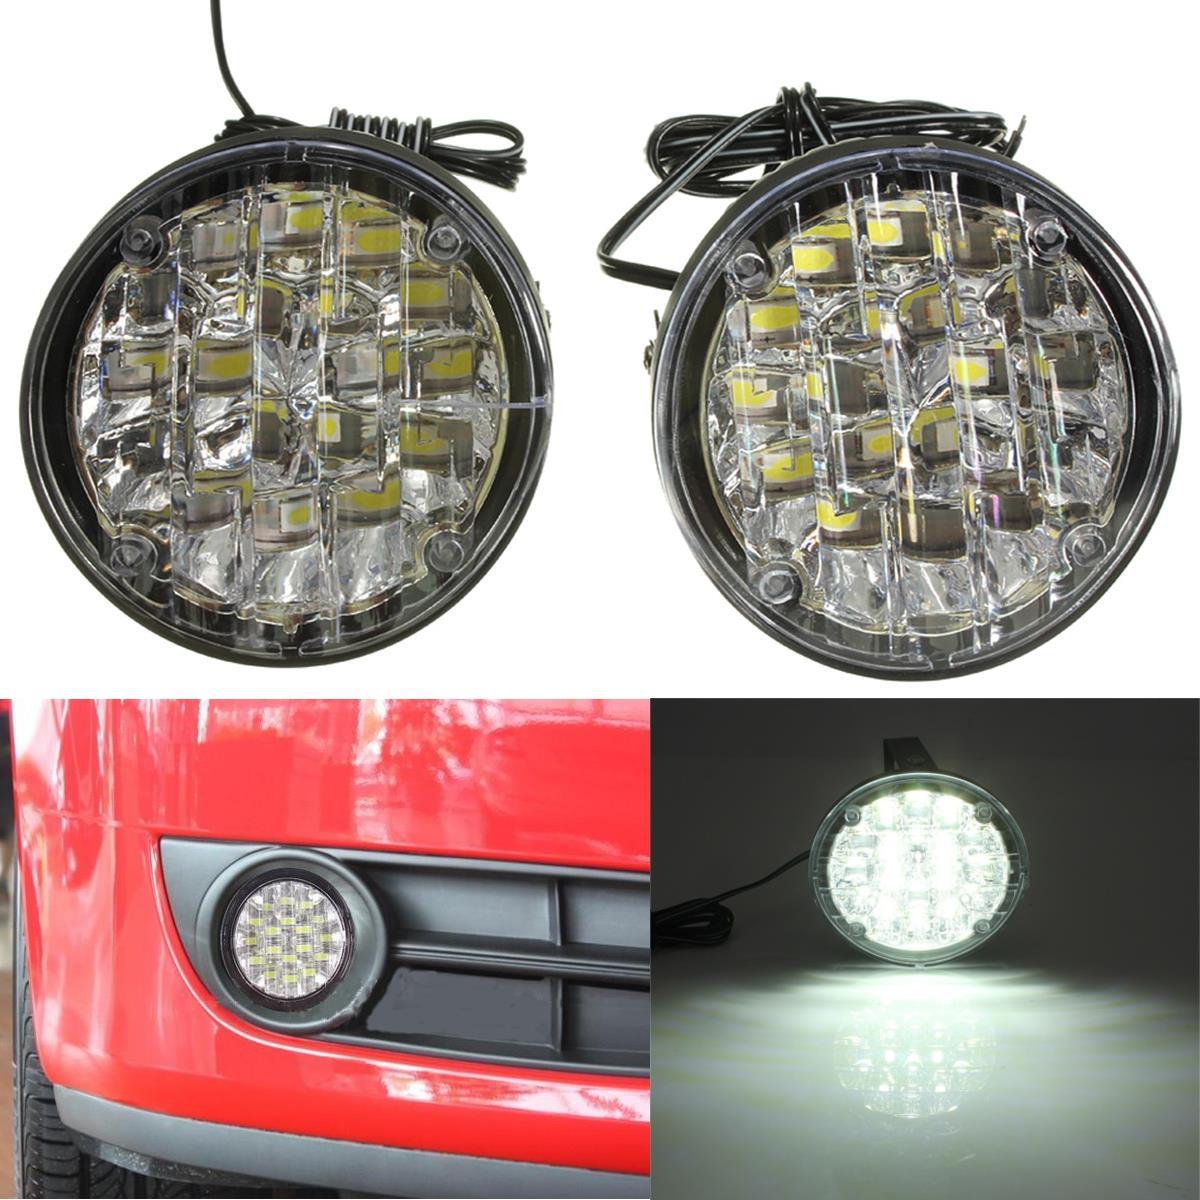 2Pcs 12V 18 LED Round Car Driving Daytime Running Light DRL Fog font b Lamp b